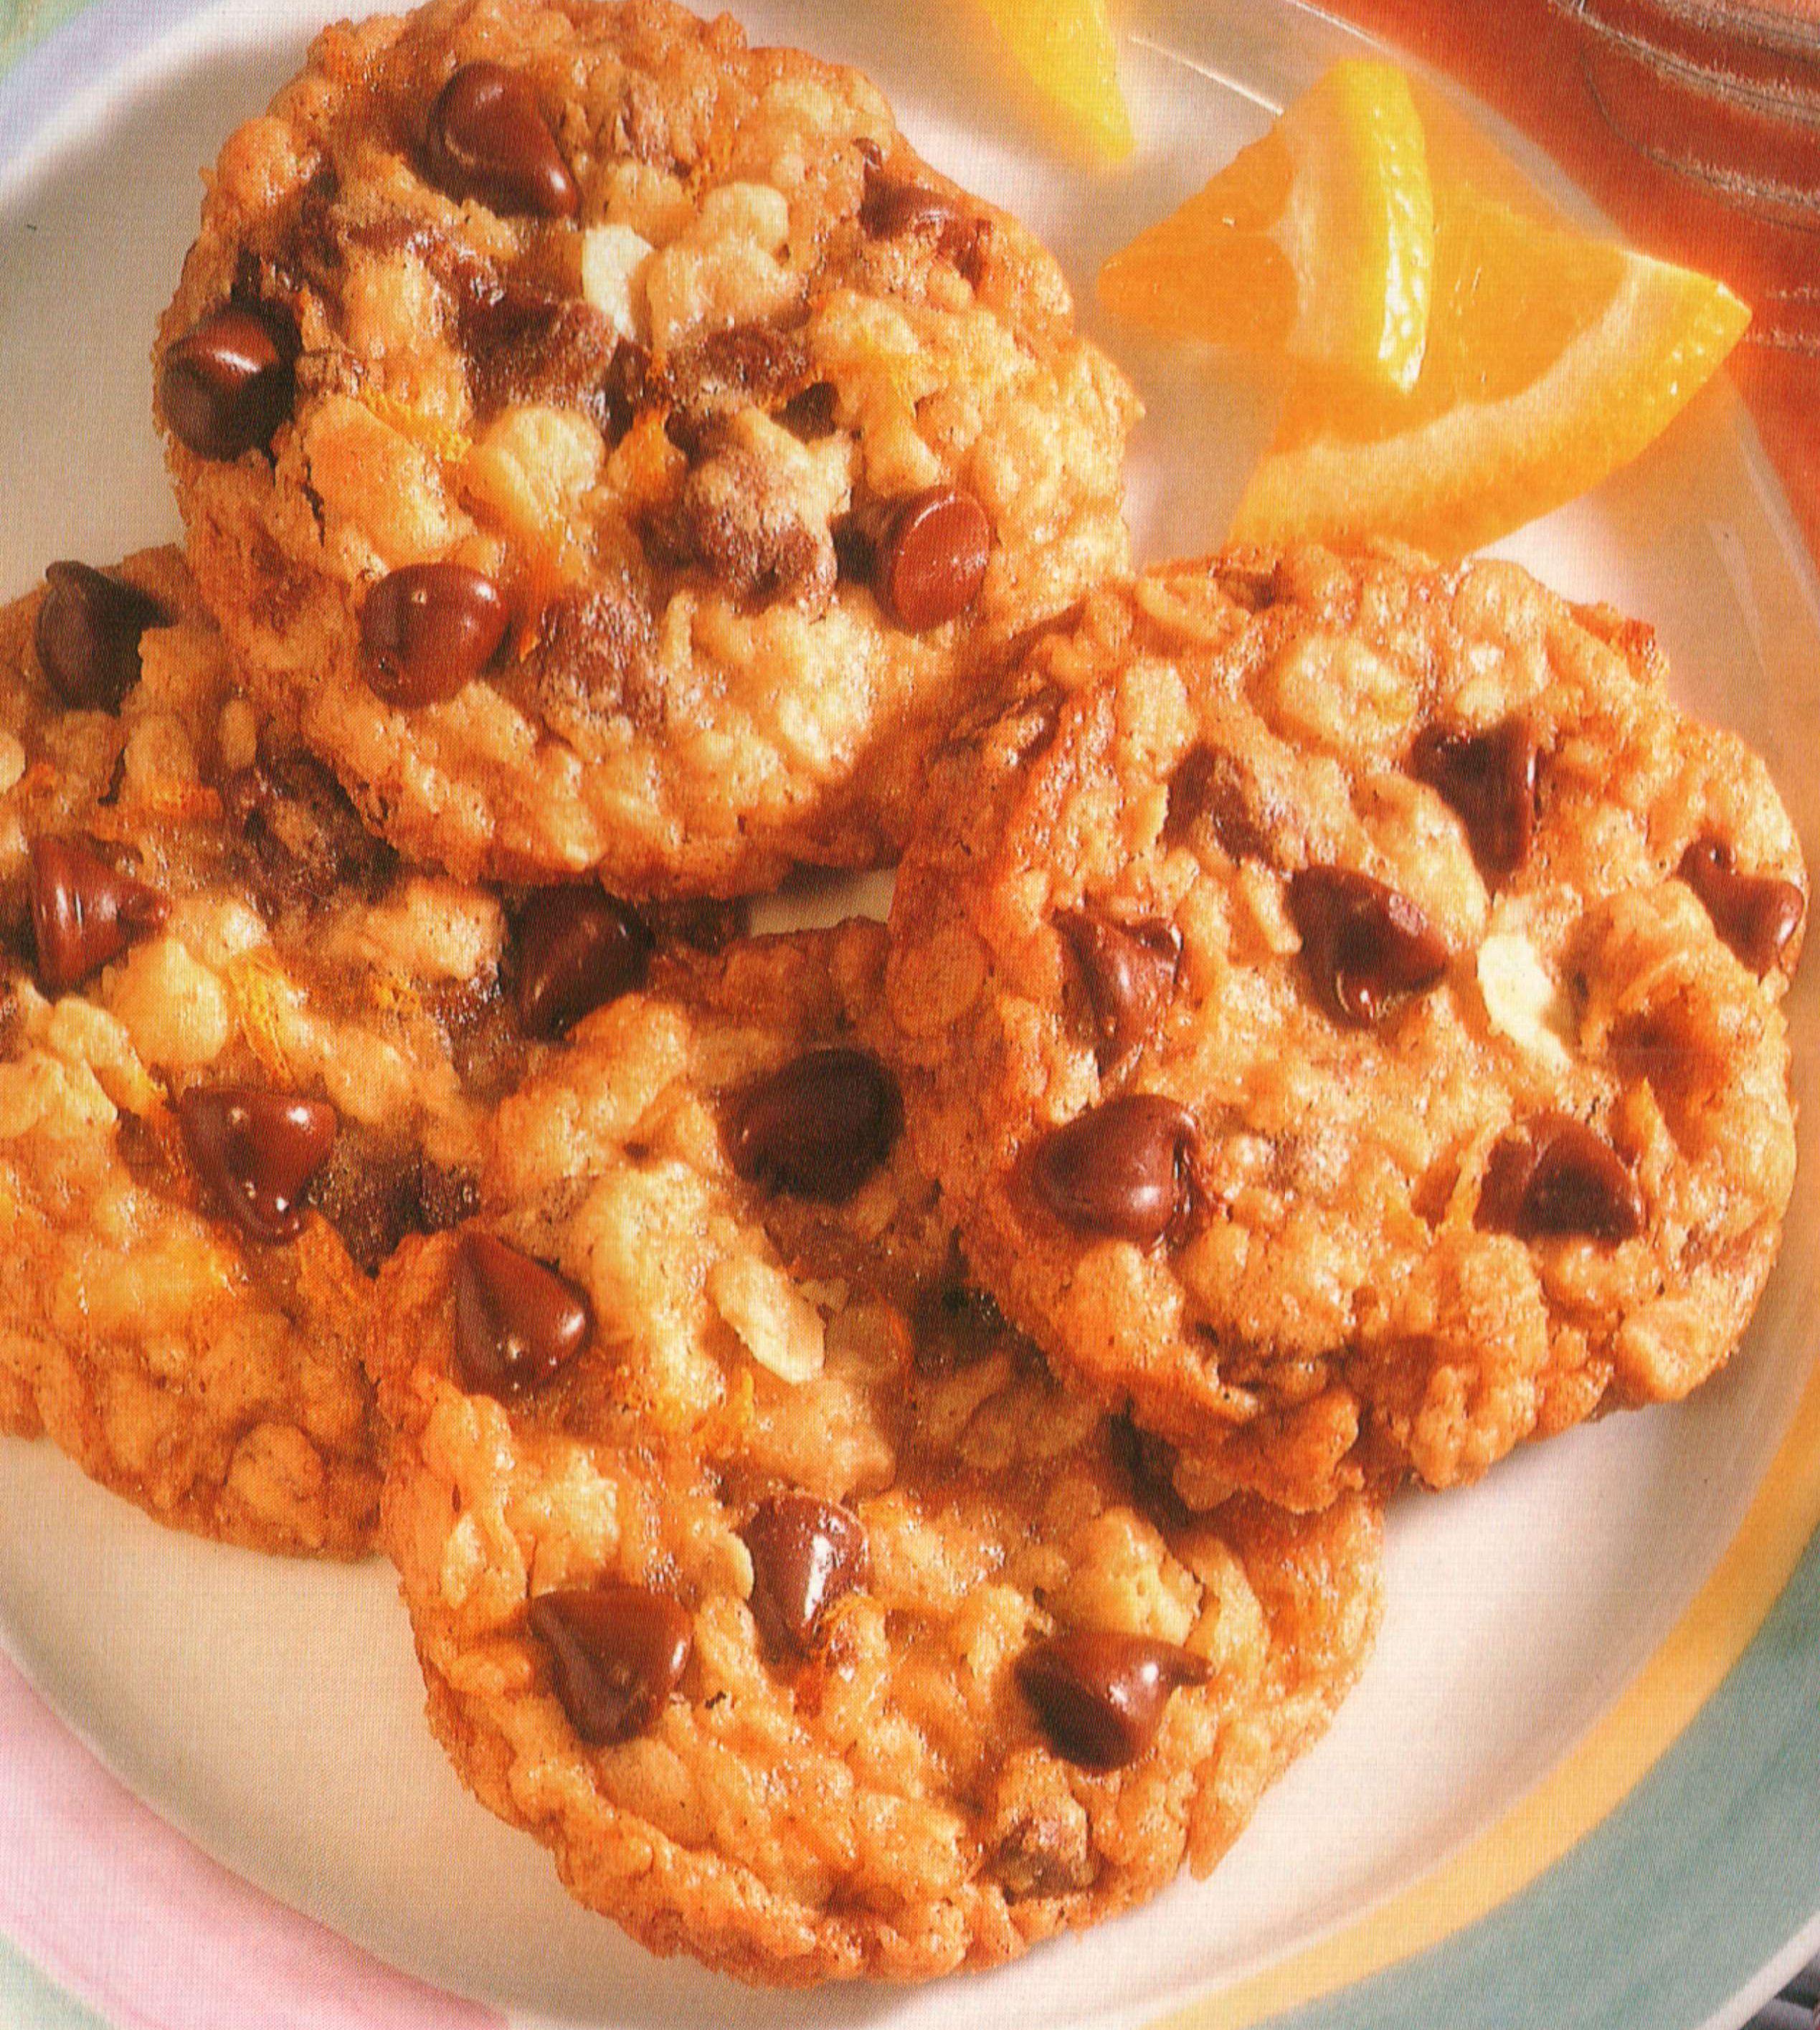 Orange Walnut Chip Cookies